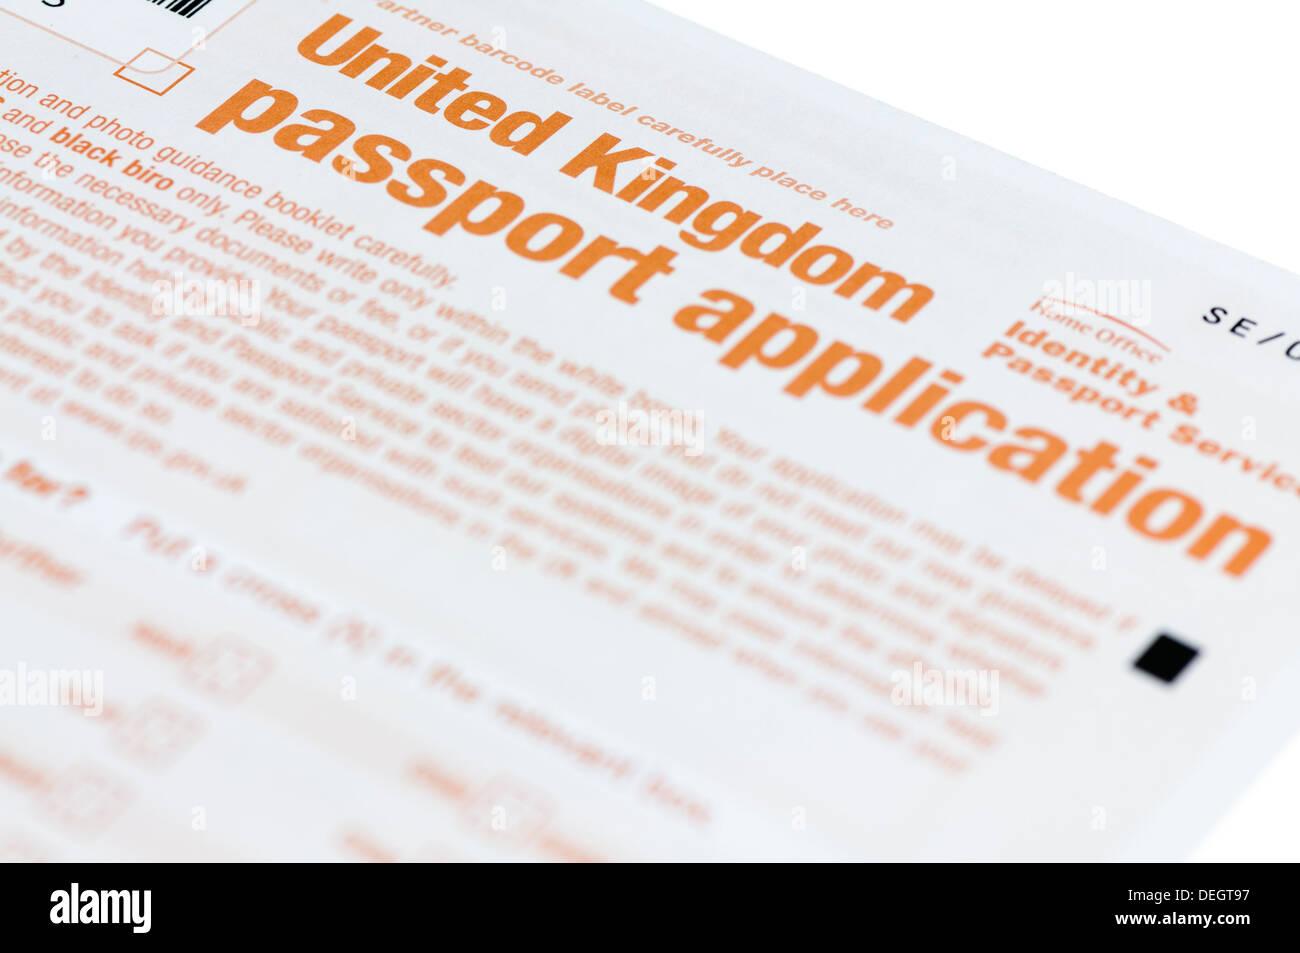 United Kingdom UK passport application form Stock Photo